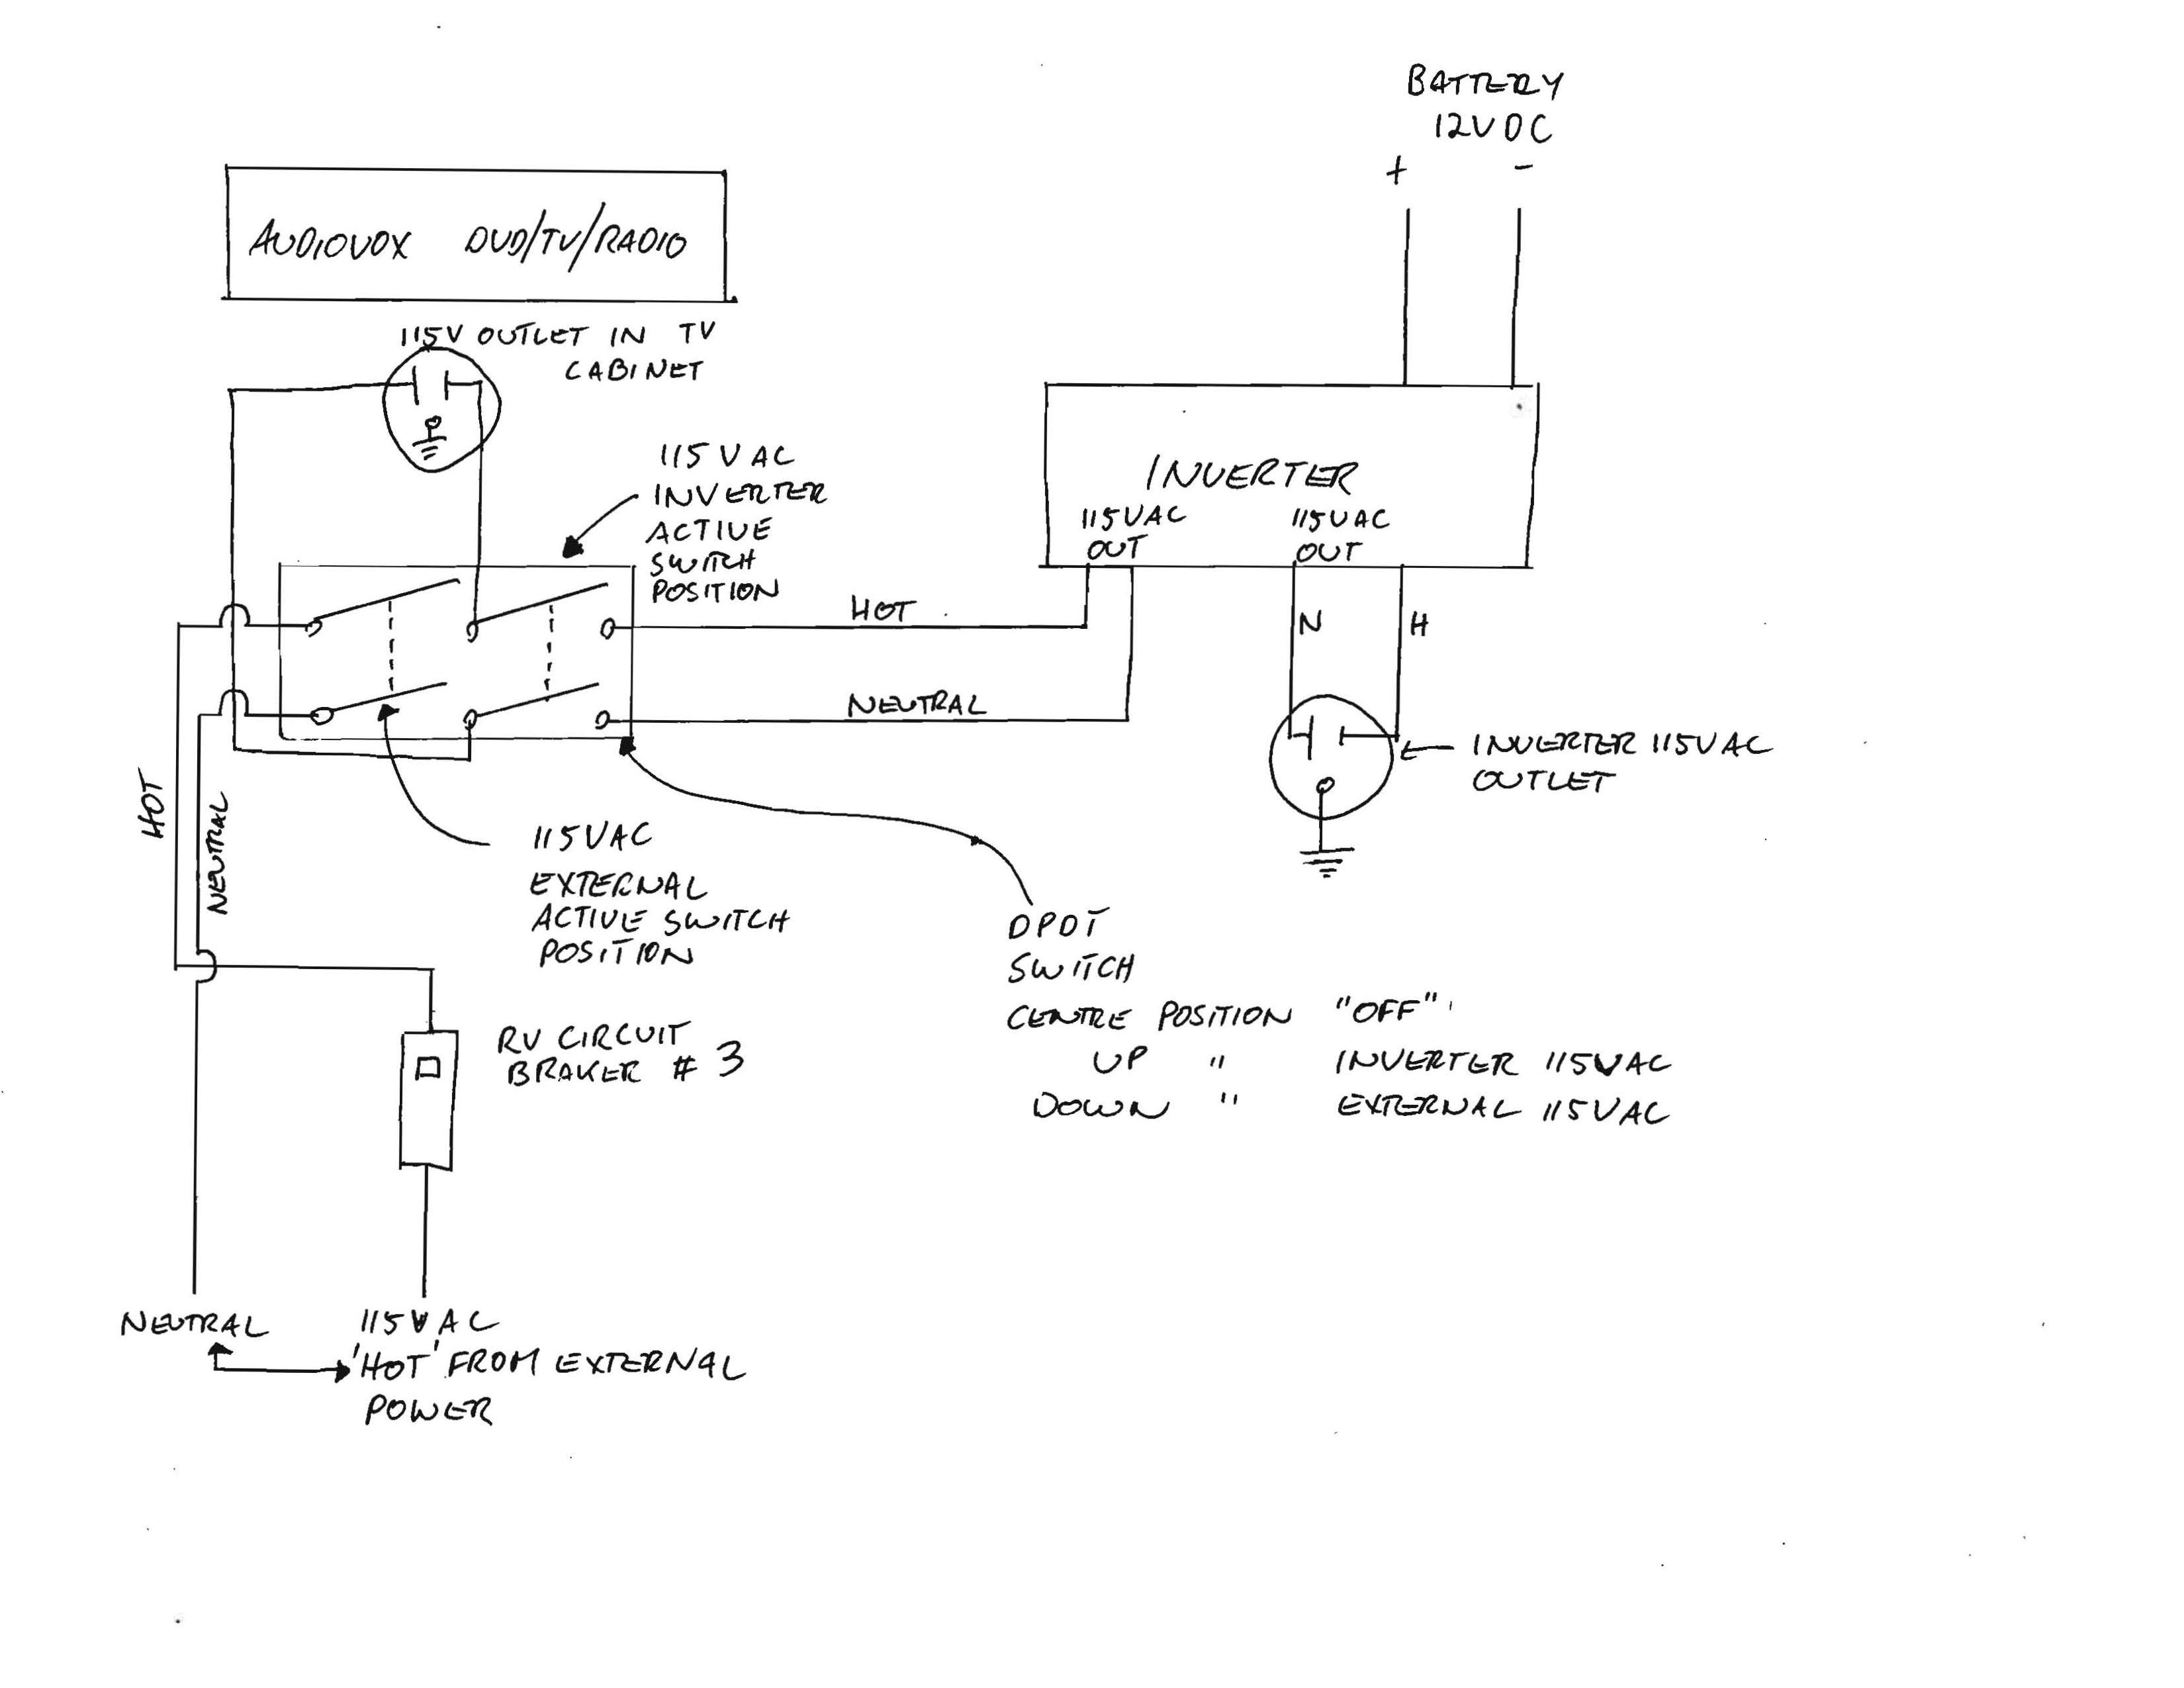 Crock Pot Wiring Diagram 24 Images Toaster Inverterresize6652c514 Of A Stove